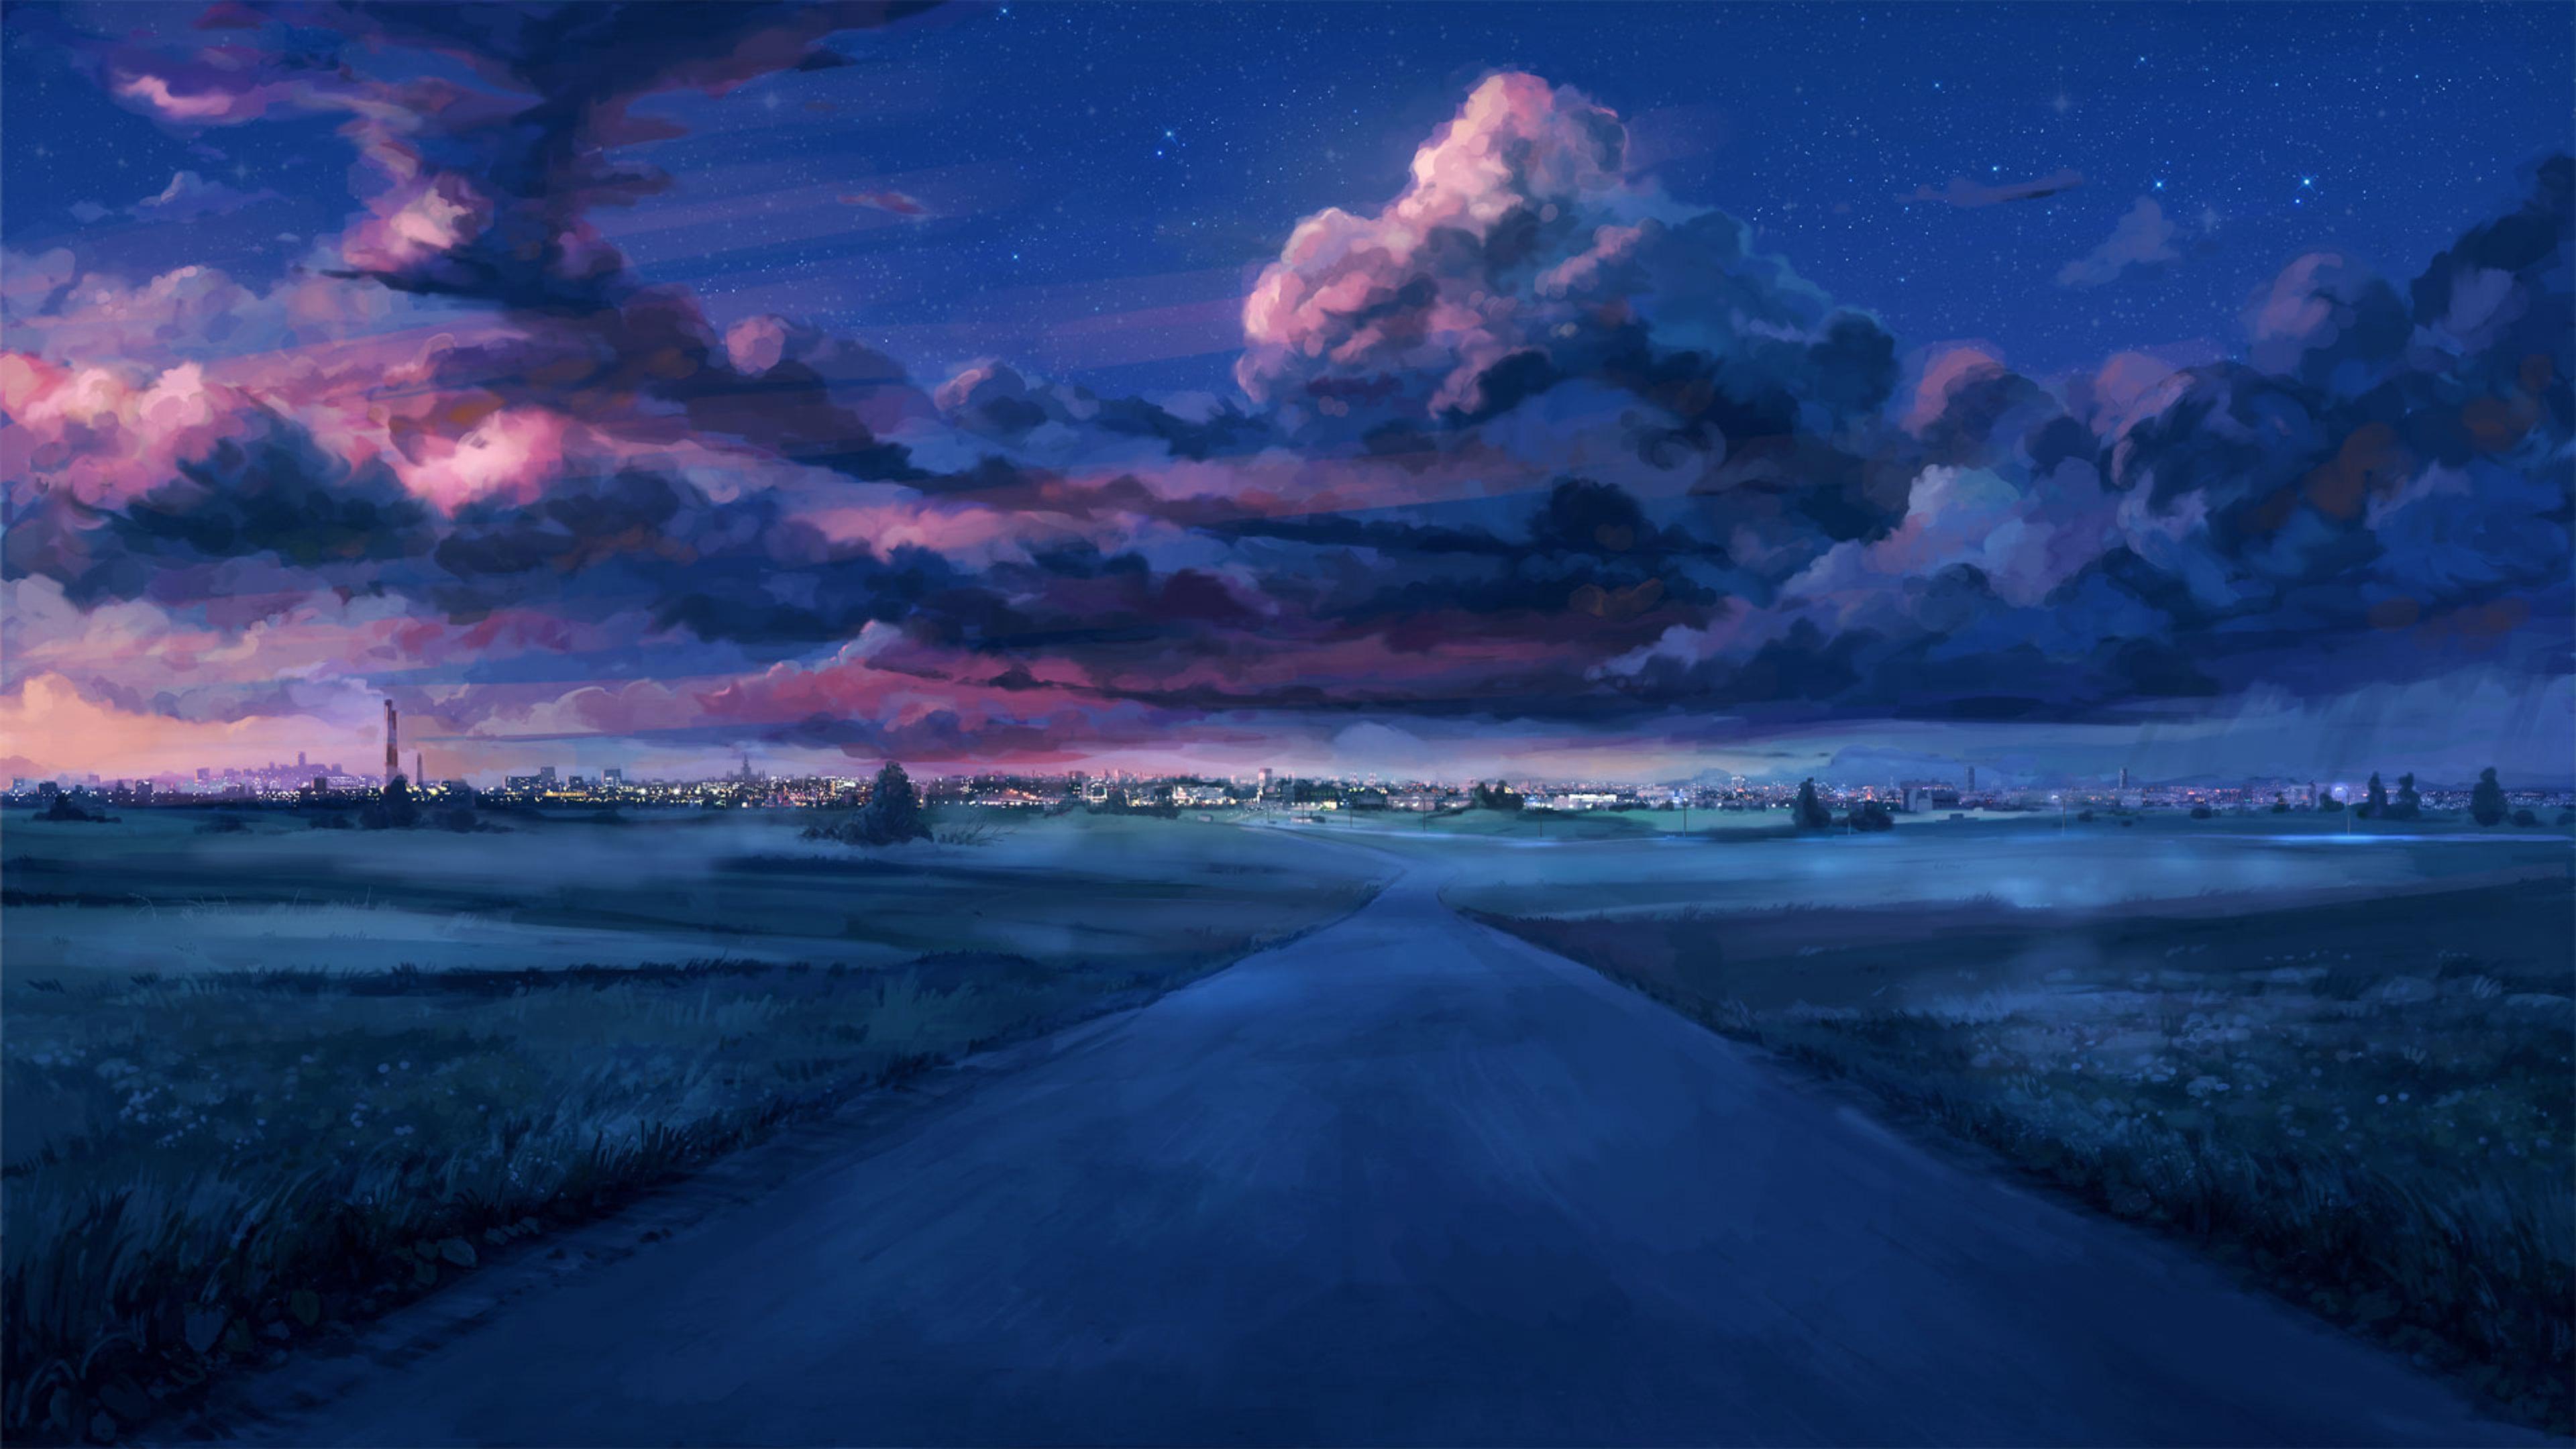 Anime Night Scenery 4K Wallpaper - Best Wallpapers